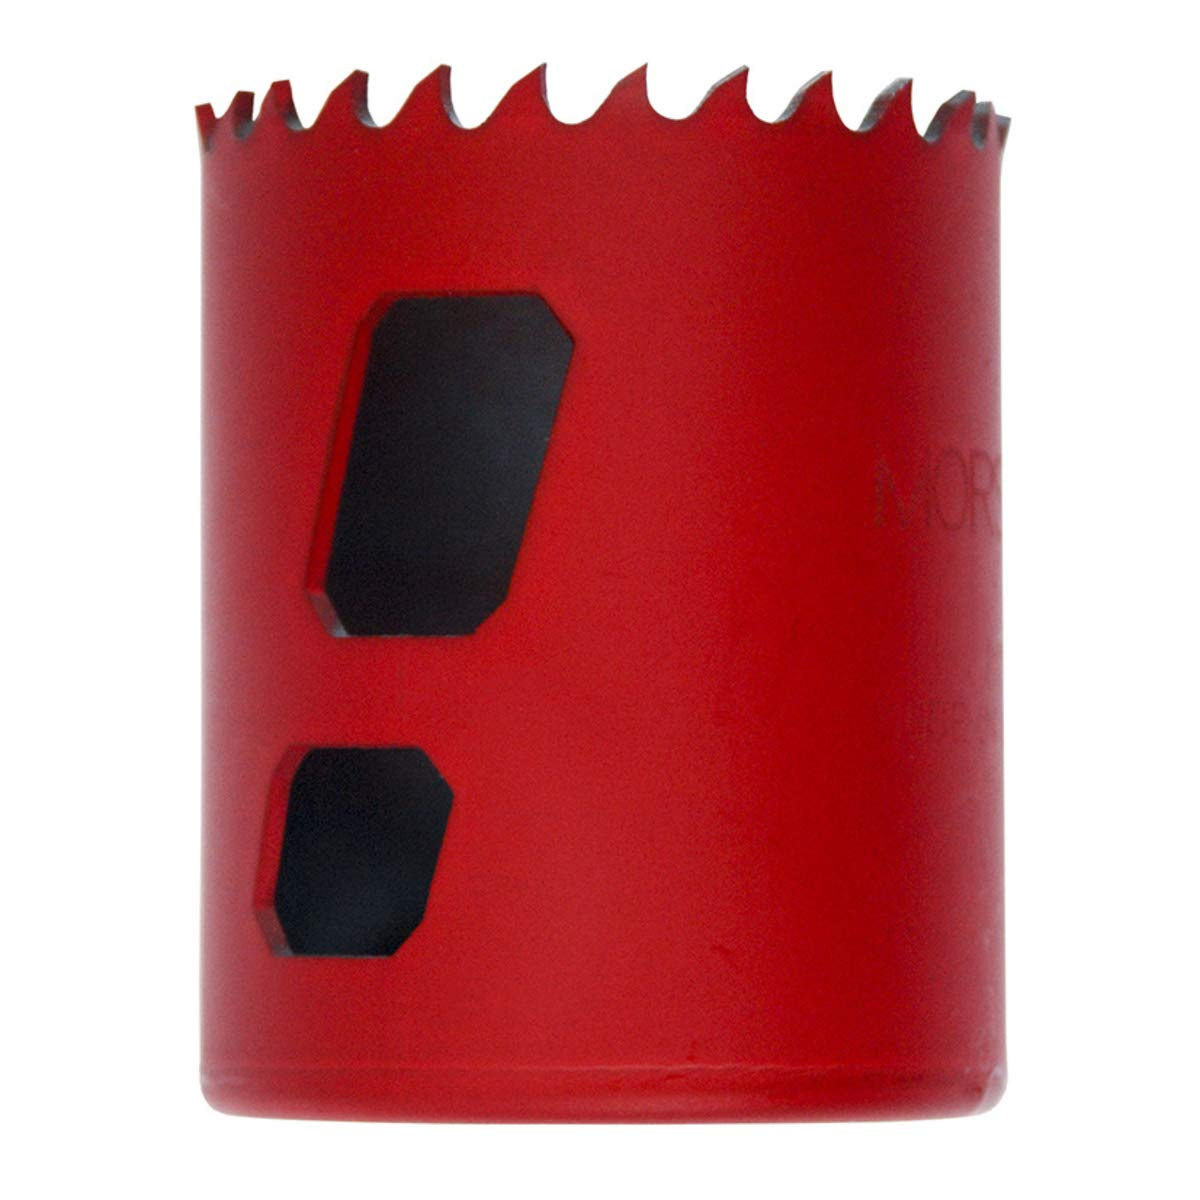 MK Morse Matrix 1/2'' X .020'' X 44 7/8'' Bi-Metal Bandsaw Blade 18W Teeth Per Inch